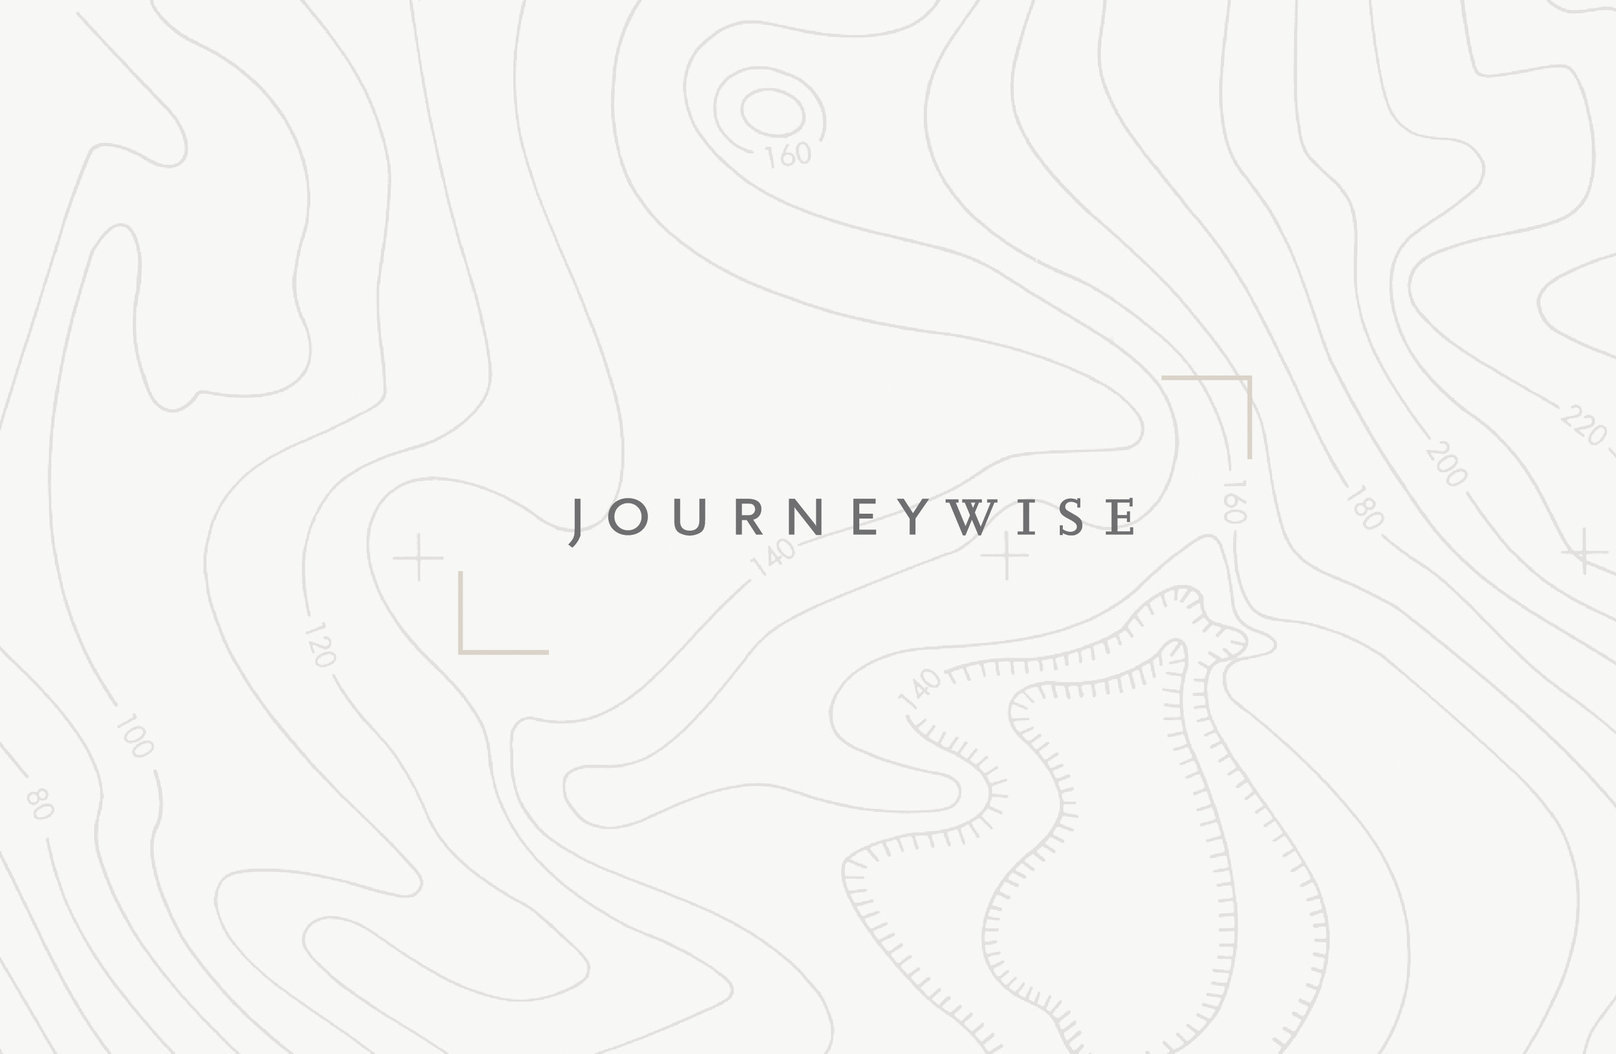 Journeywise Logo Design